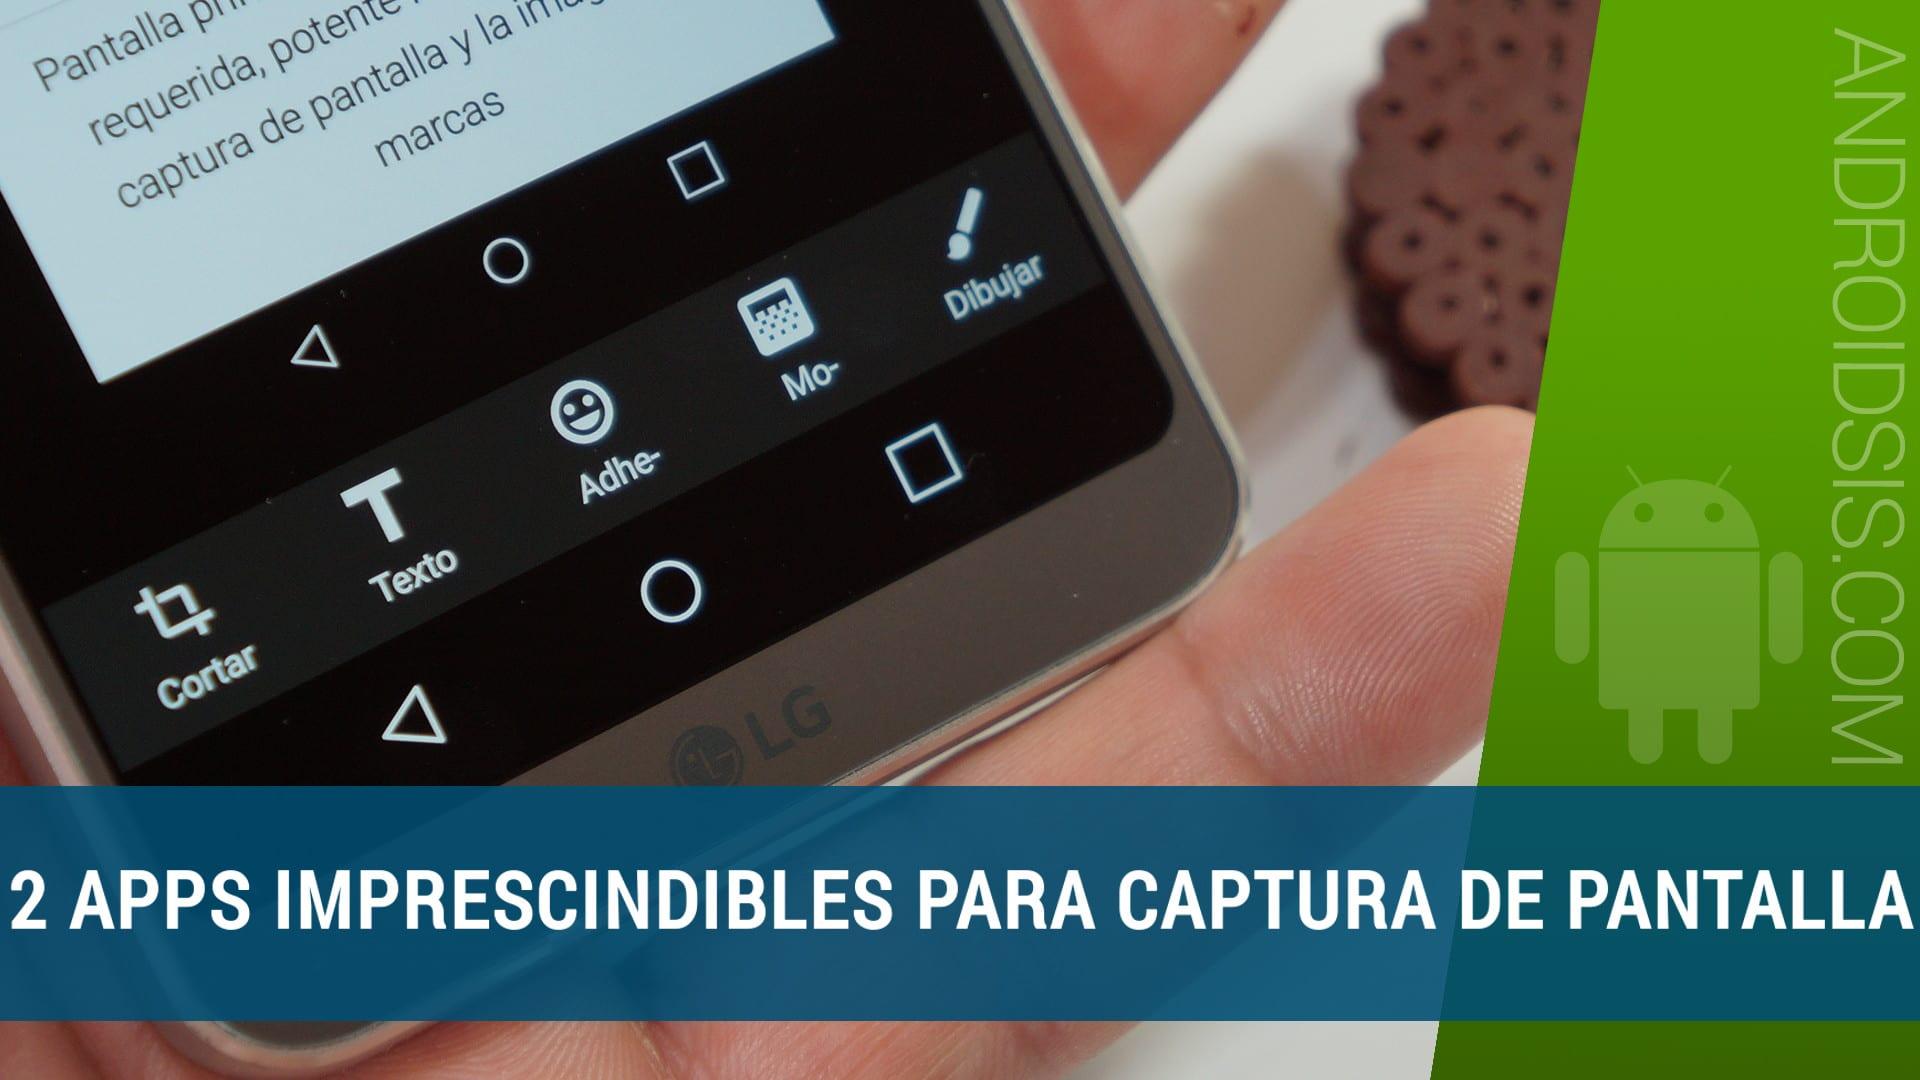 2 Apps imprescindibles de captura de pantalla para Android